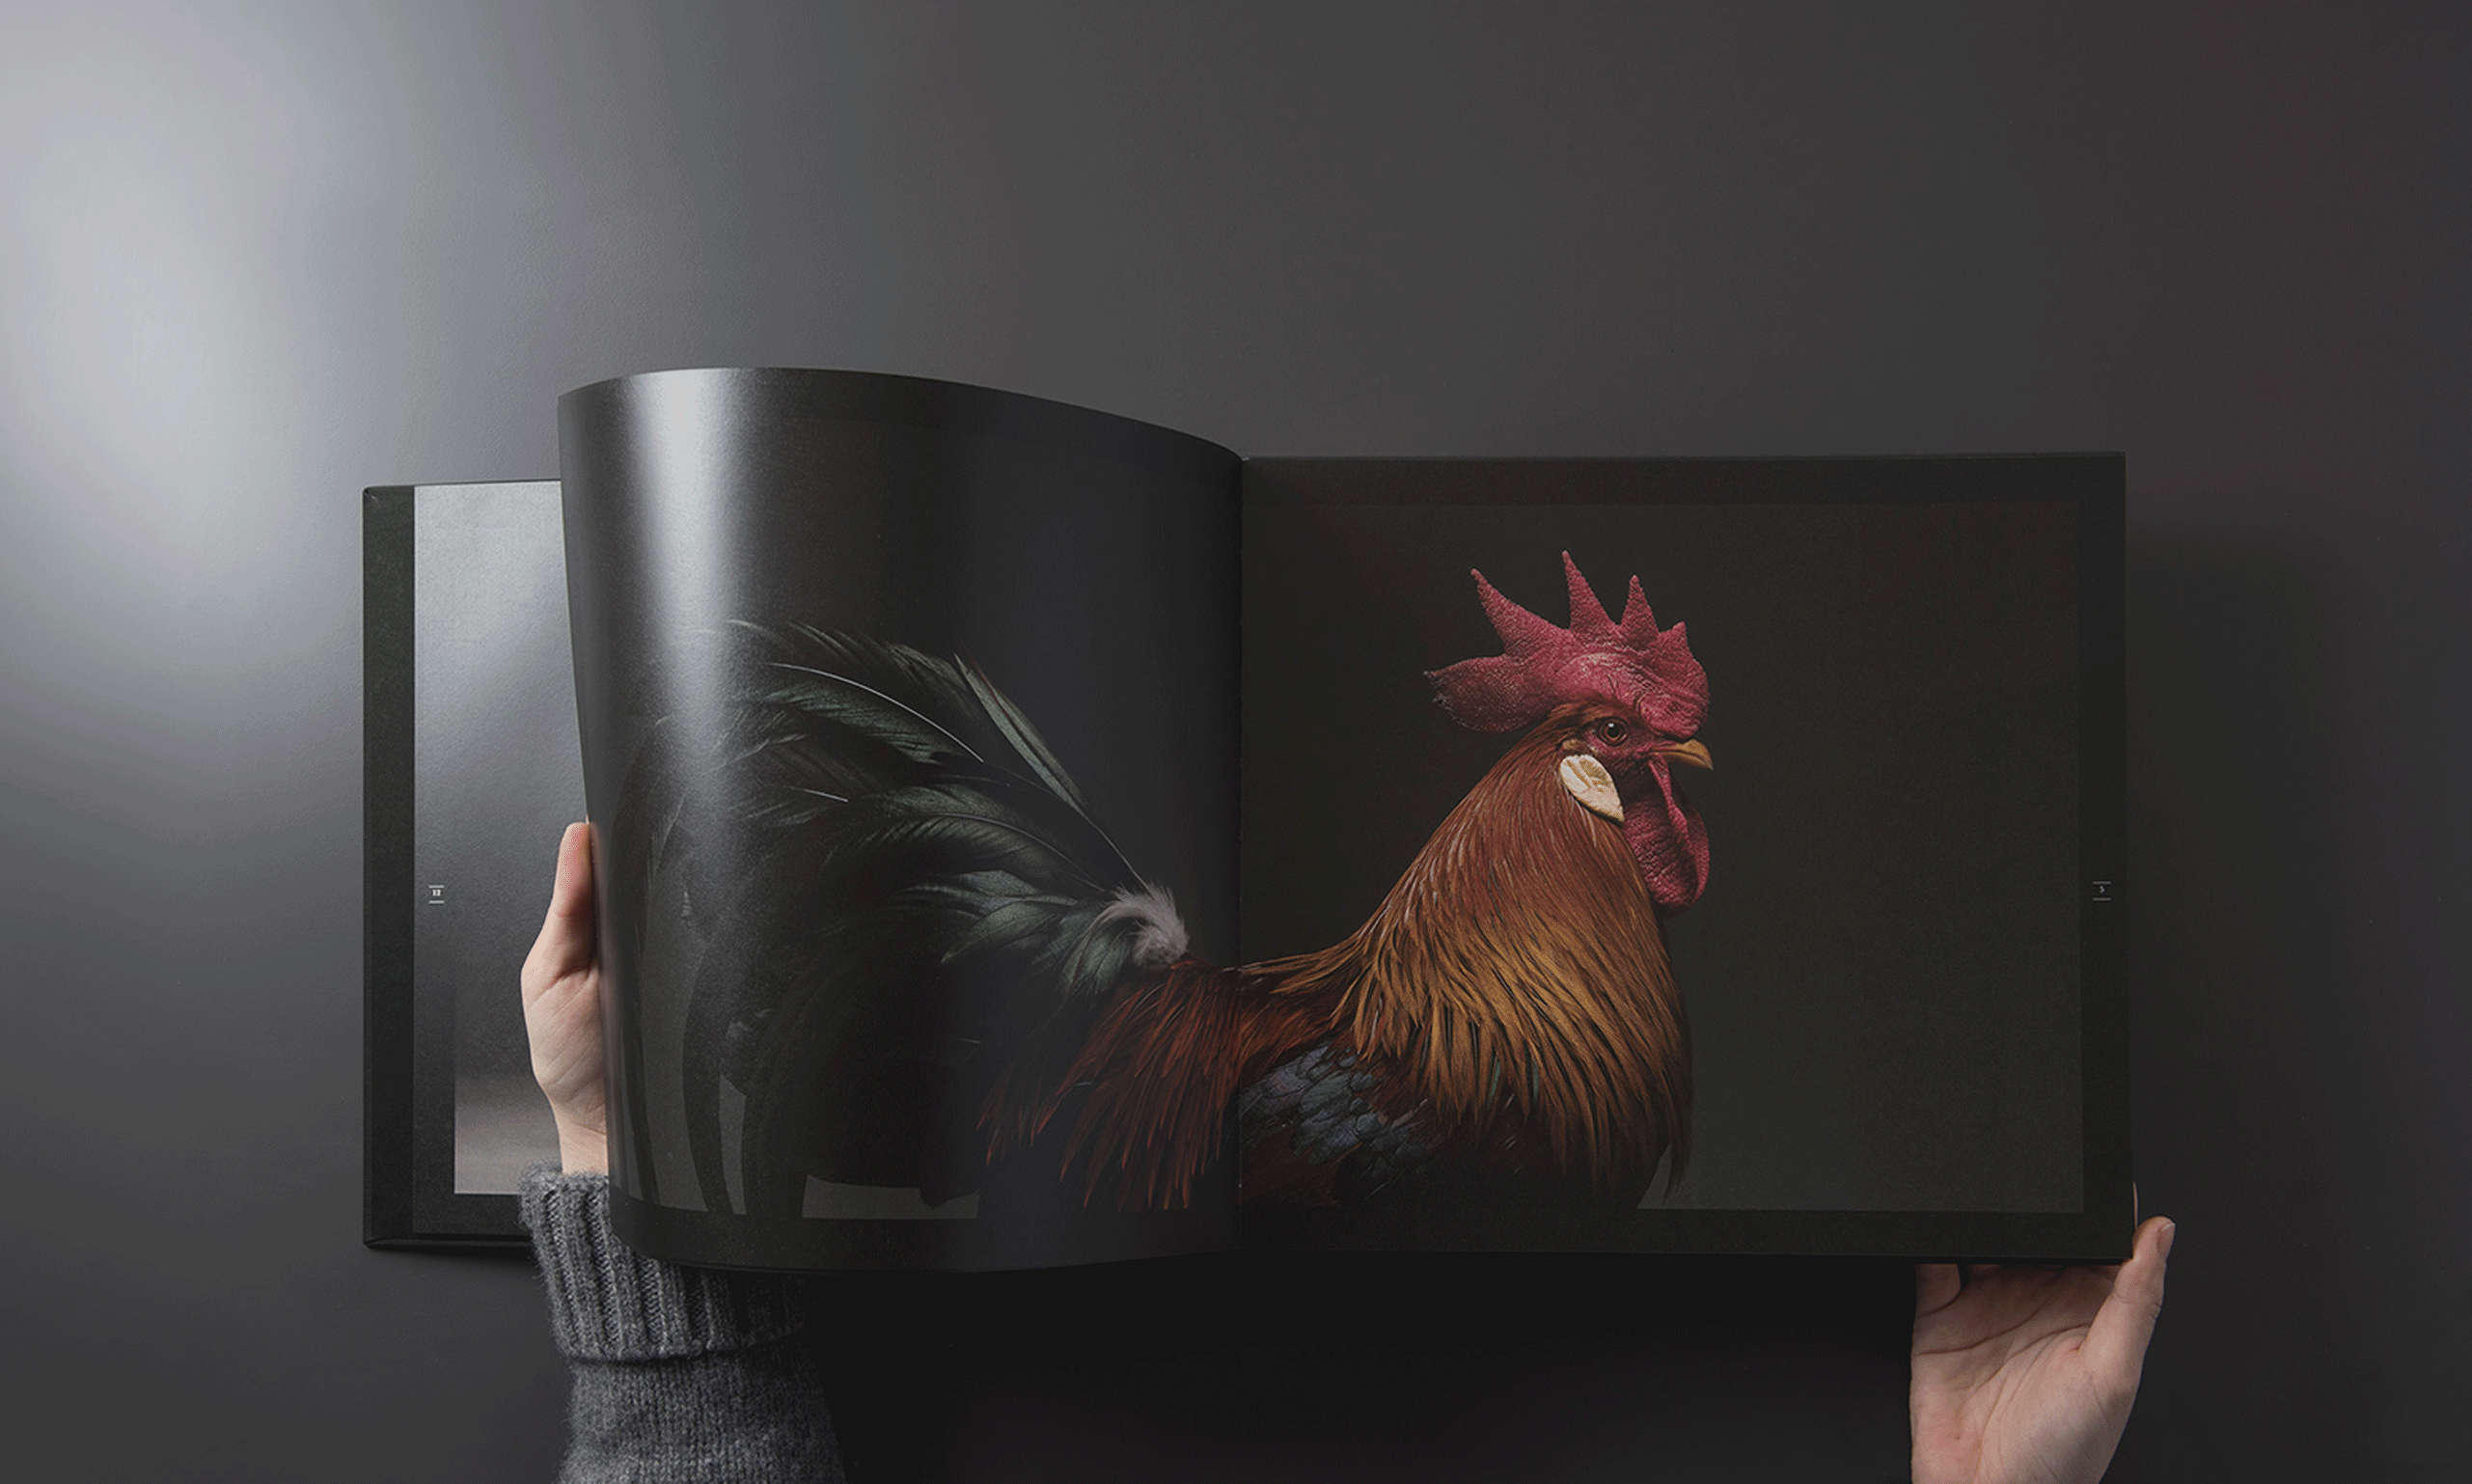 ZOOlander, a Milano anche le galline fanno le top model